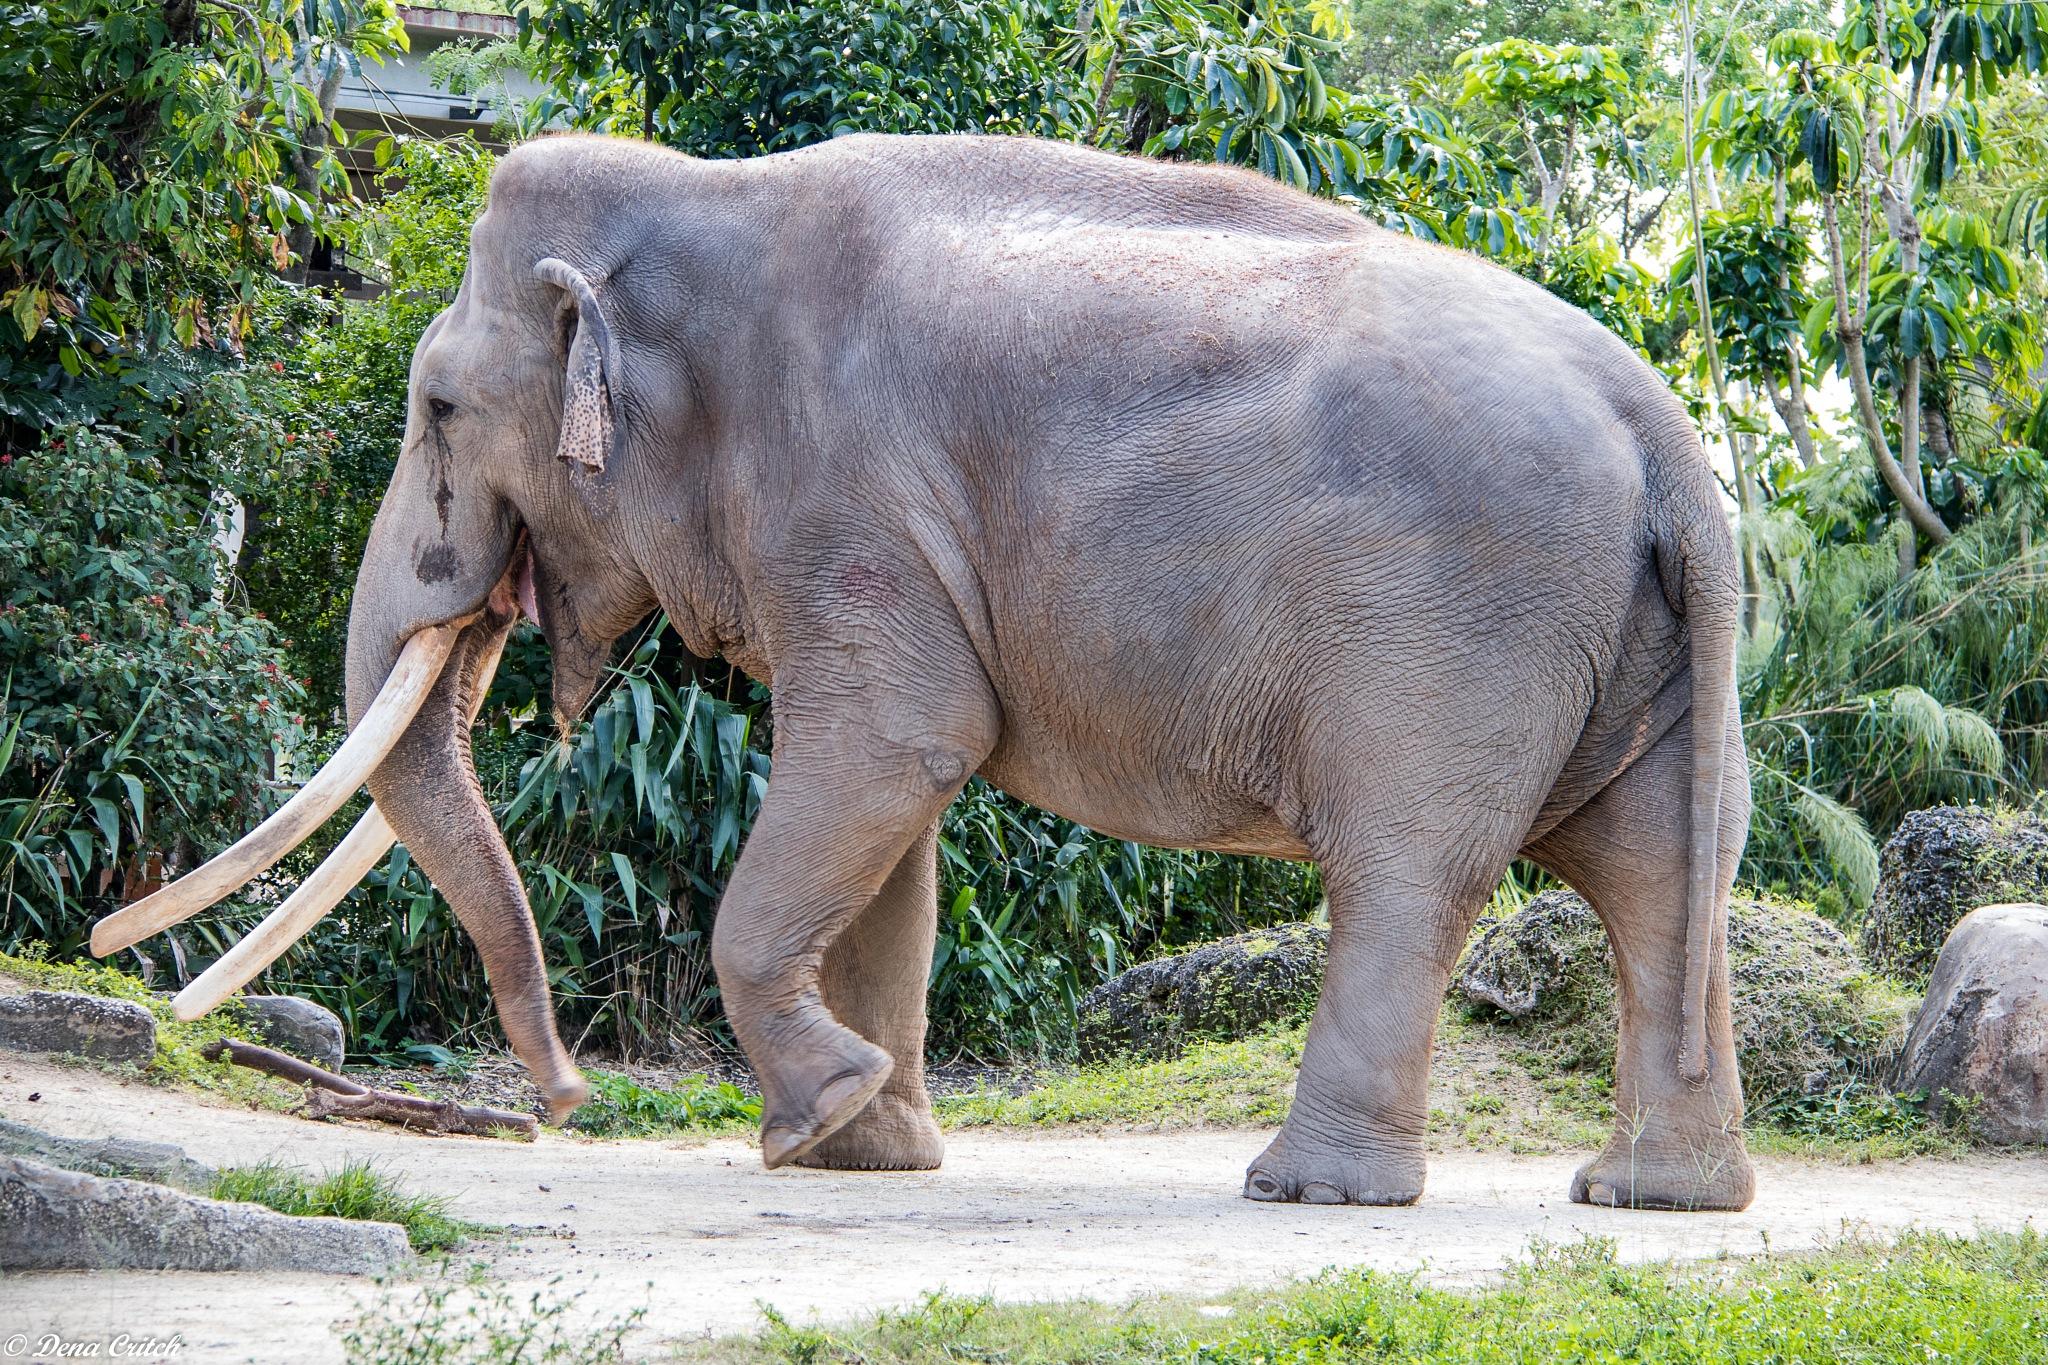 Mr. Elephant by dena.critch